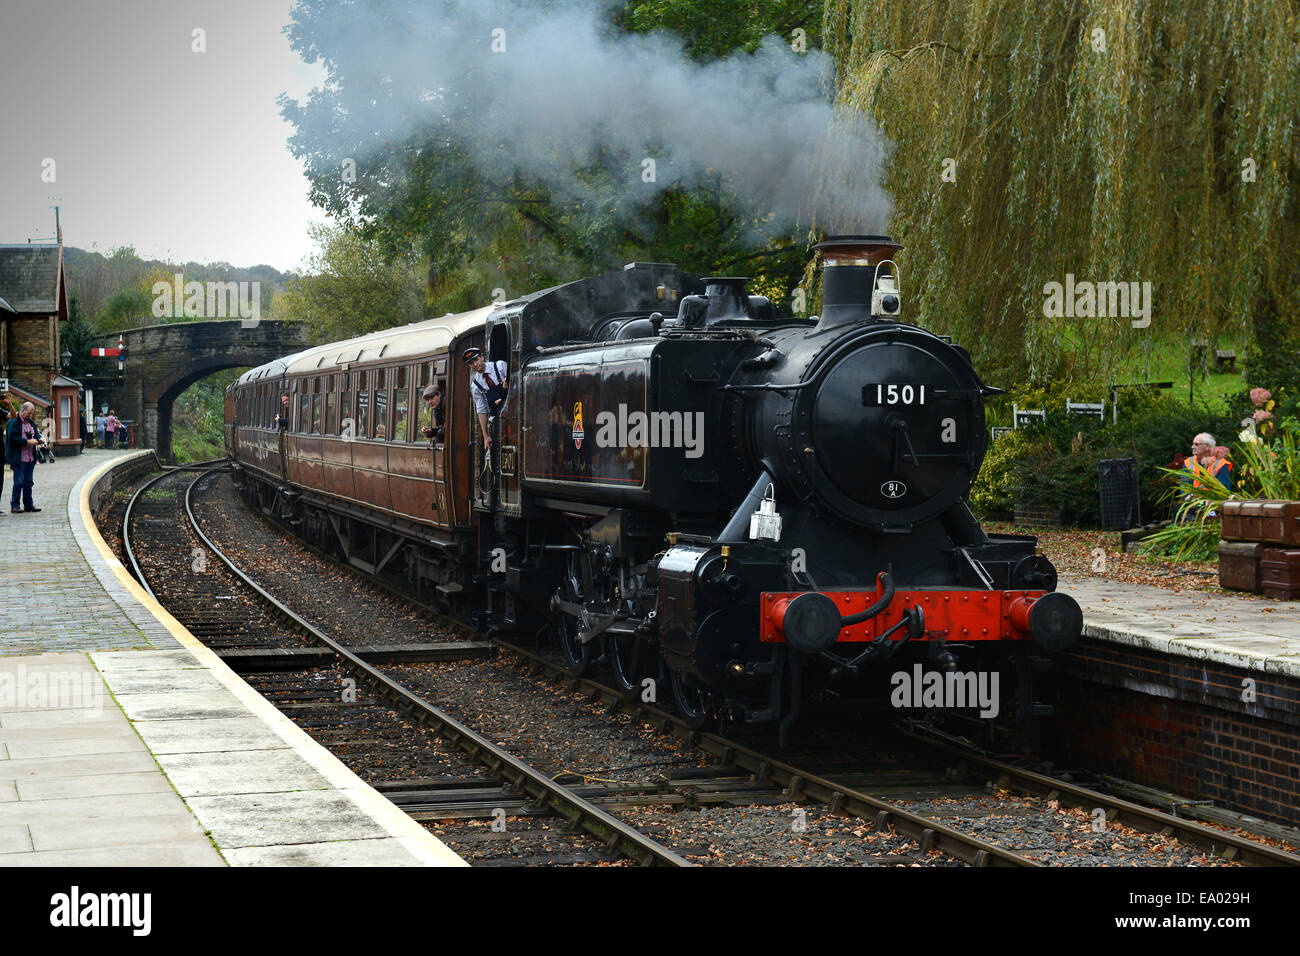 Severn Valley Railway steam locomotives locomotive train at Arley Station Uk - Stock Image